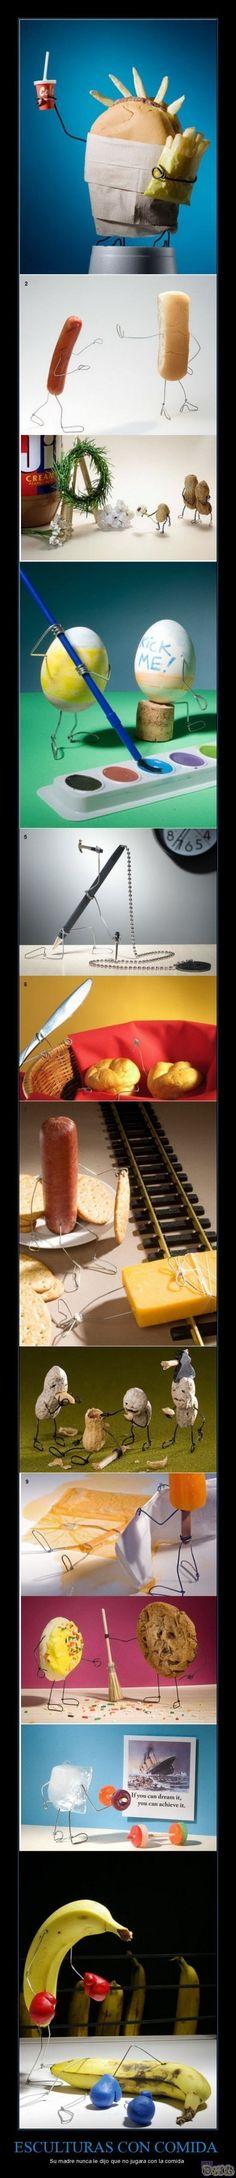 food art at its best